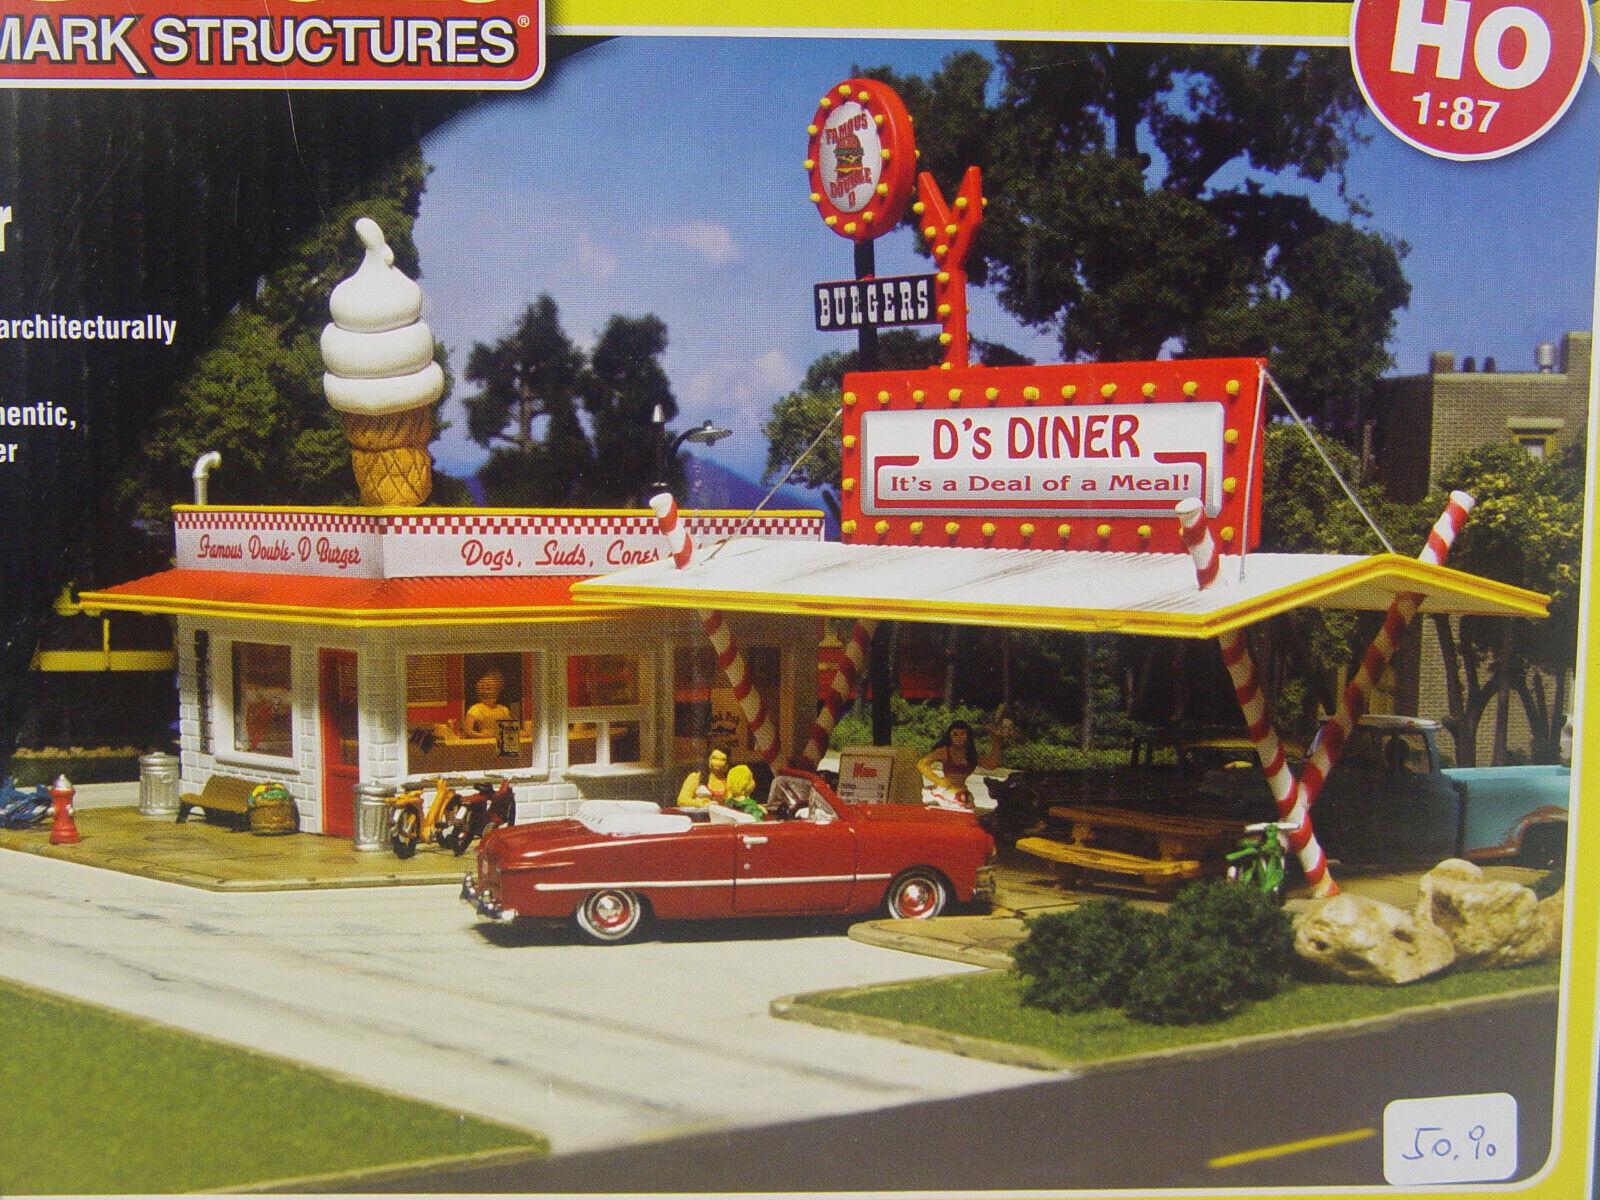 US Drive In In In Raststätte f. Straße  - Woodland  HO Bausatz  PF 5188  E  | Online  23bee8